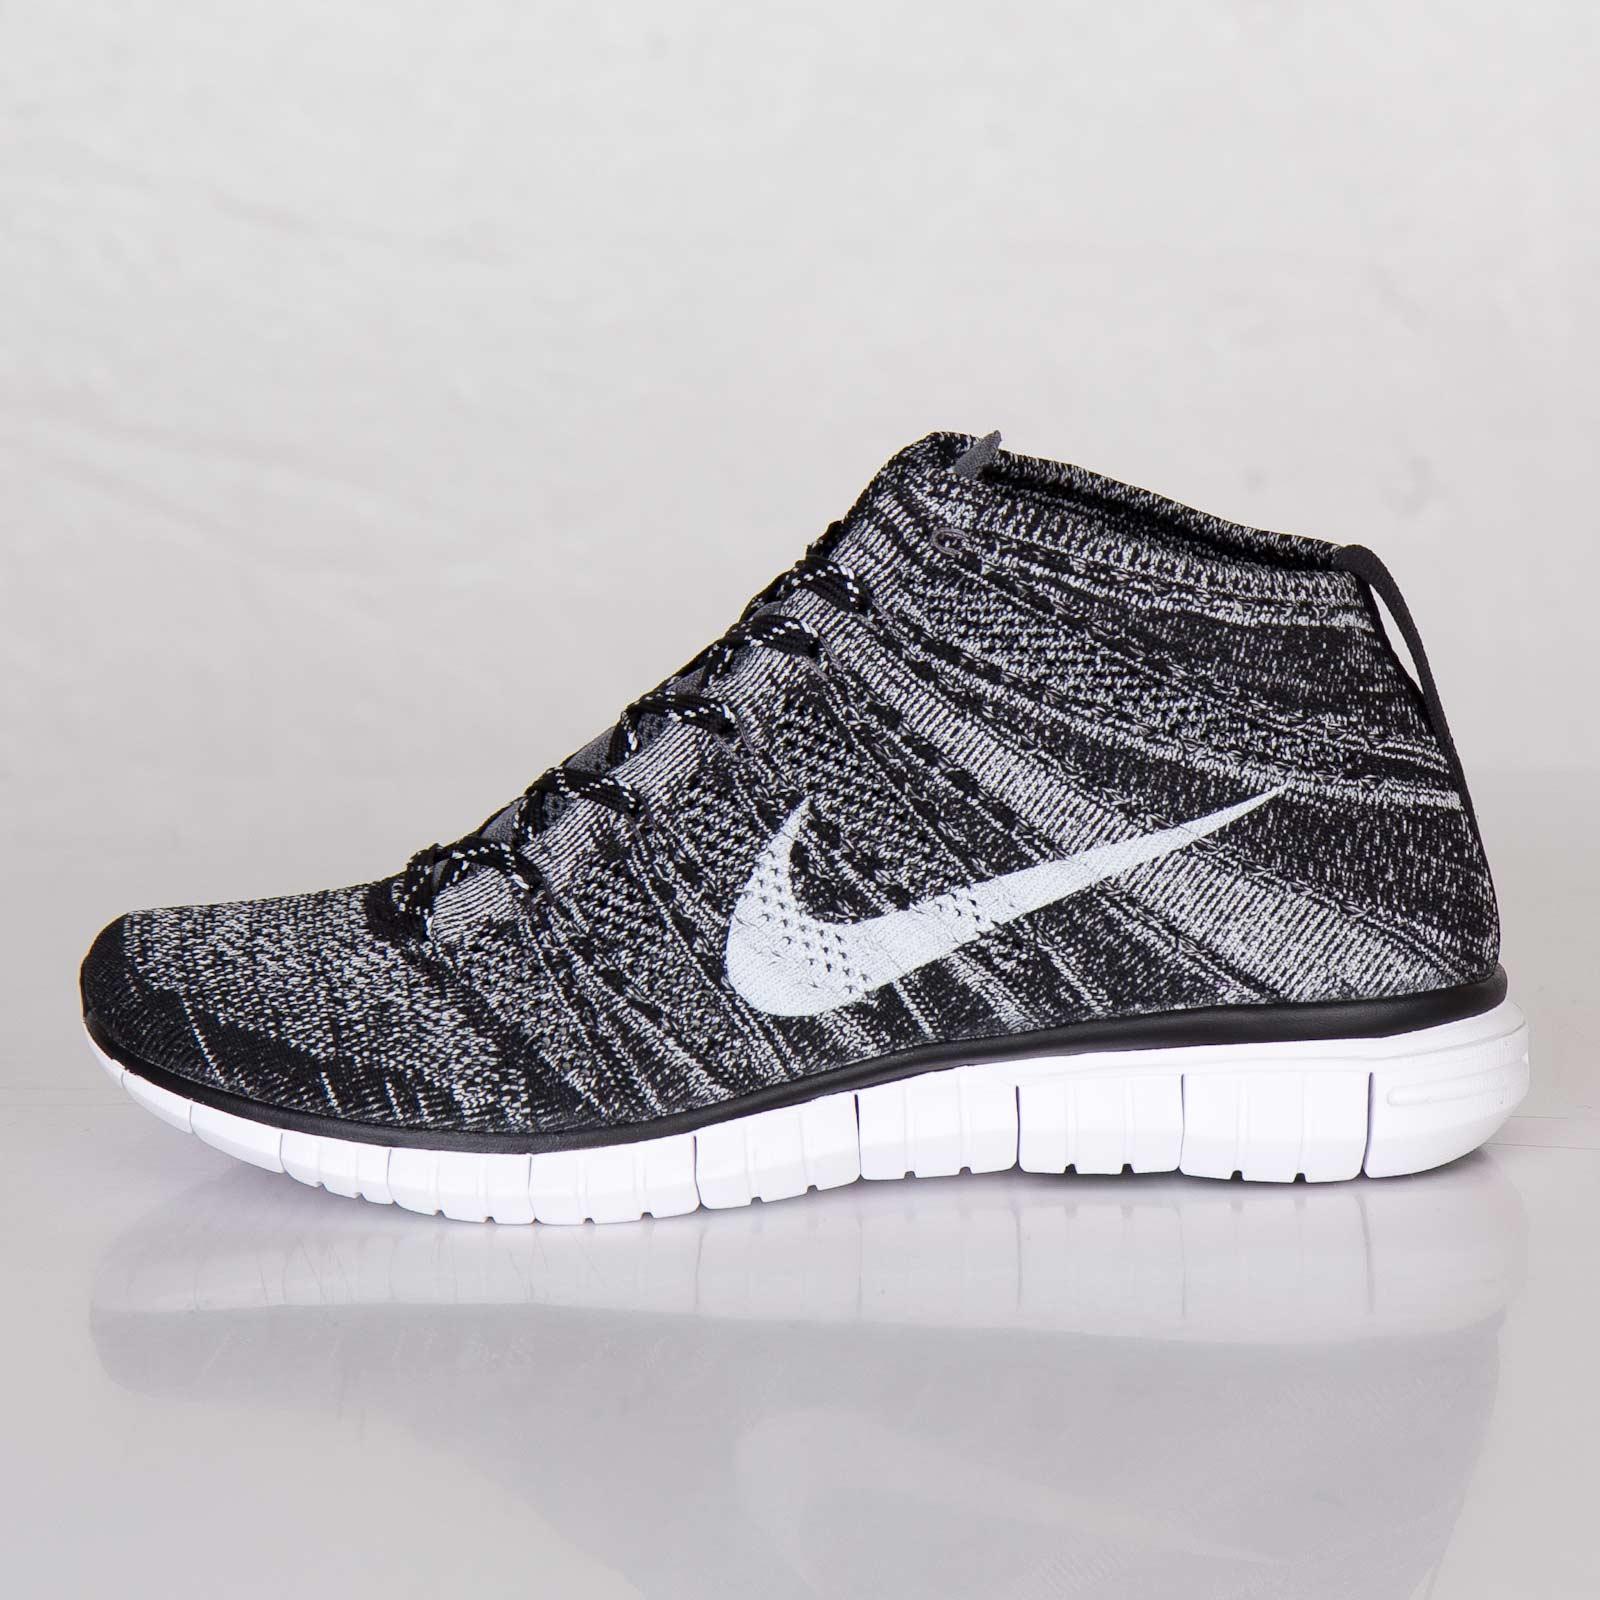 62f97025a5eb67 Nike Free Flyknit Chukka - 639700-001 - Sneakersnstuff